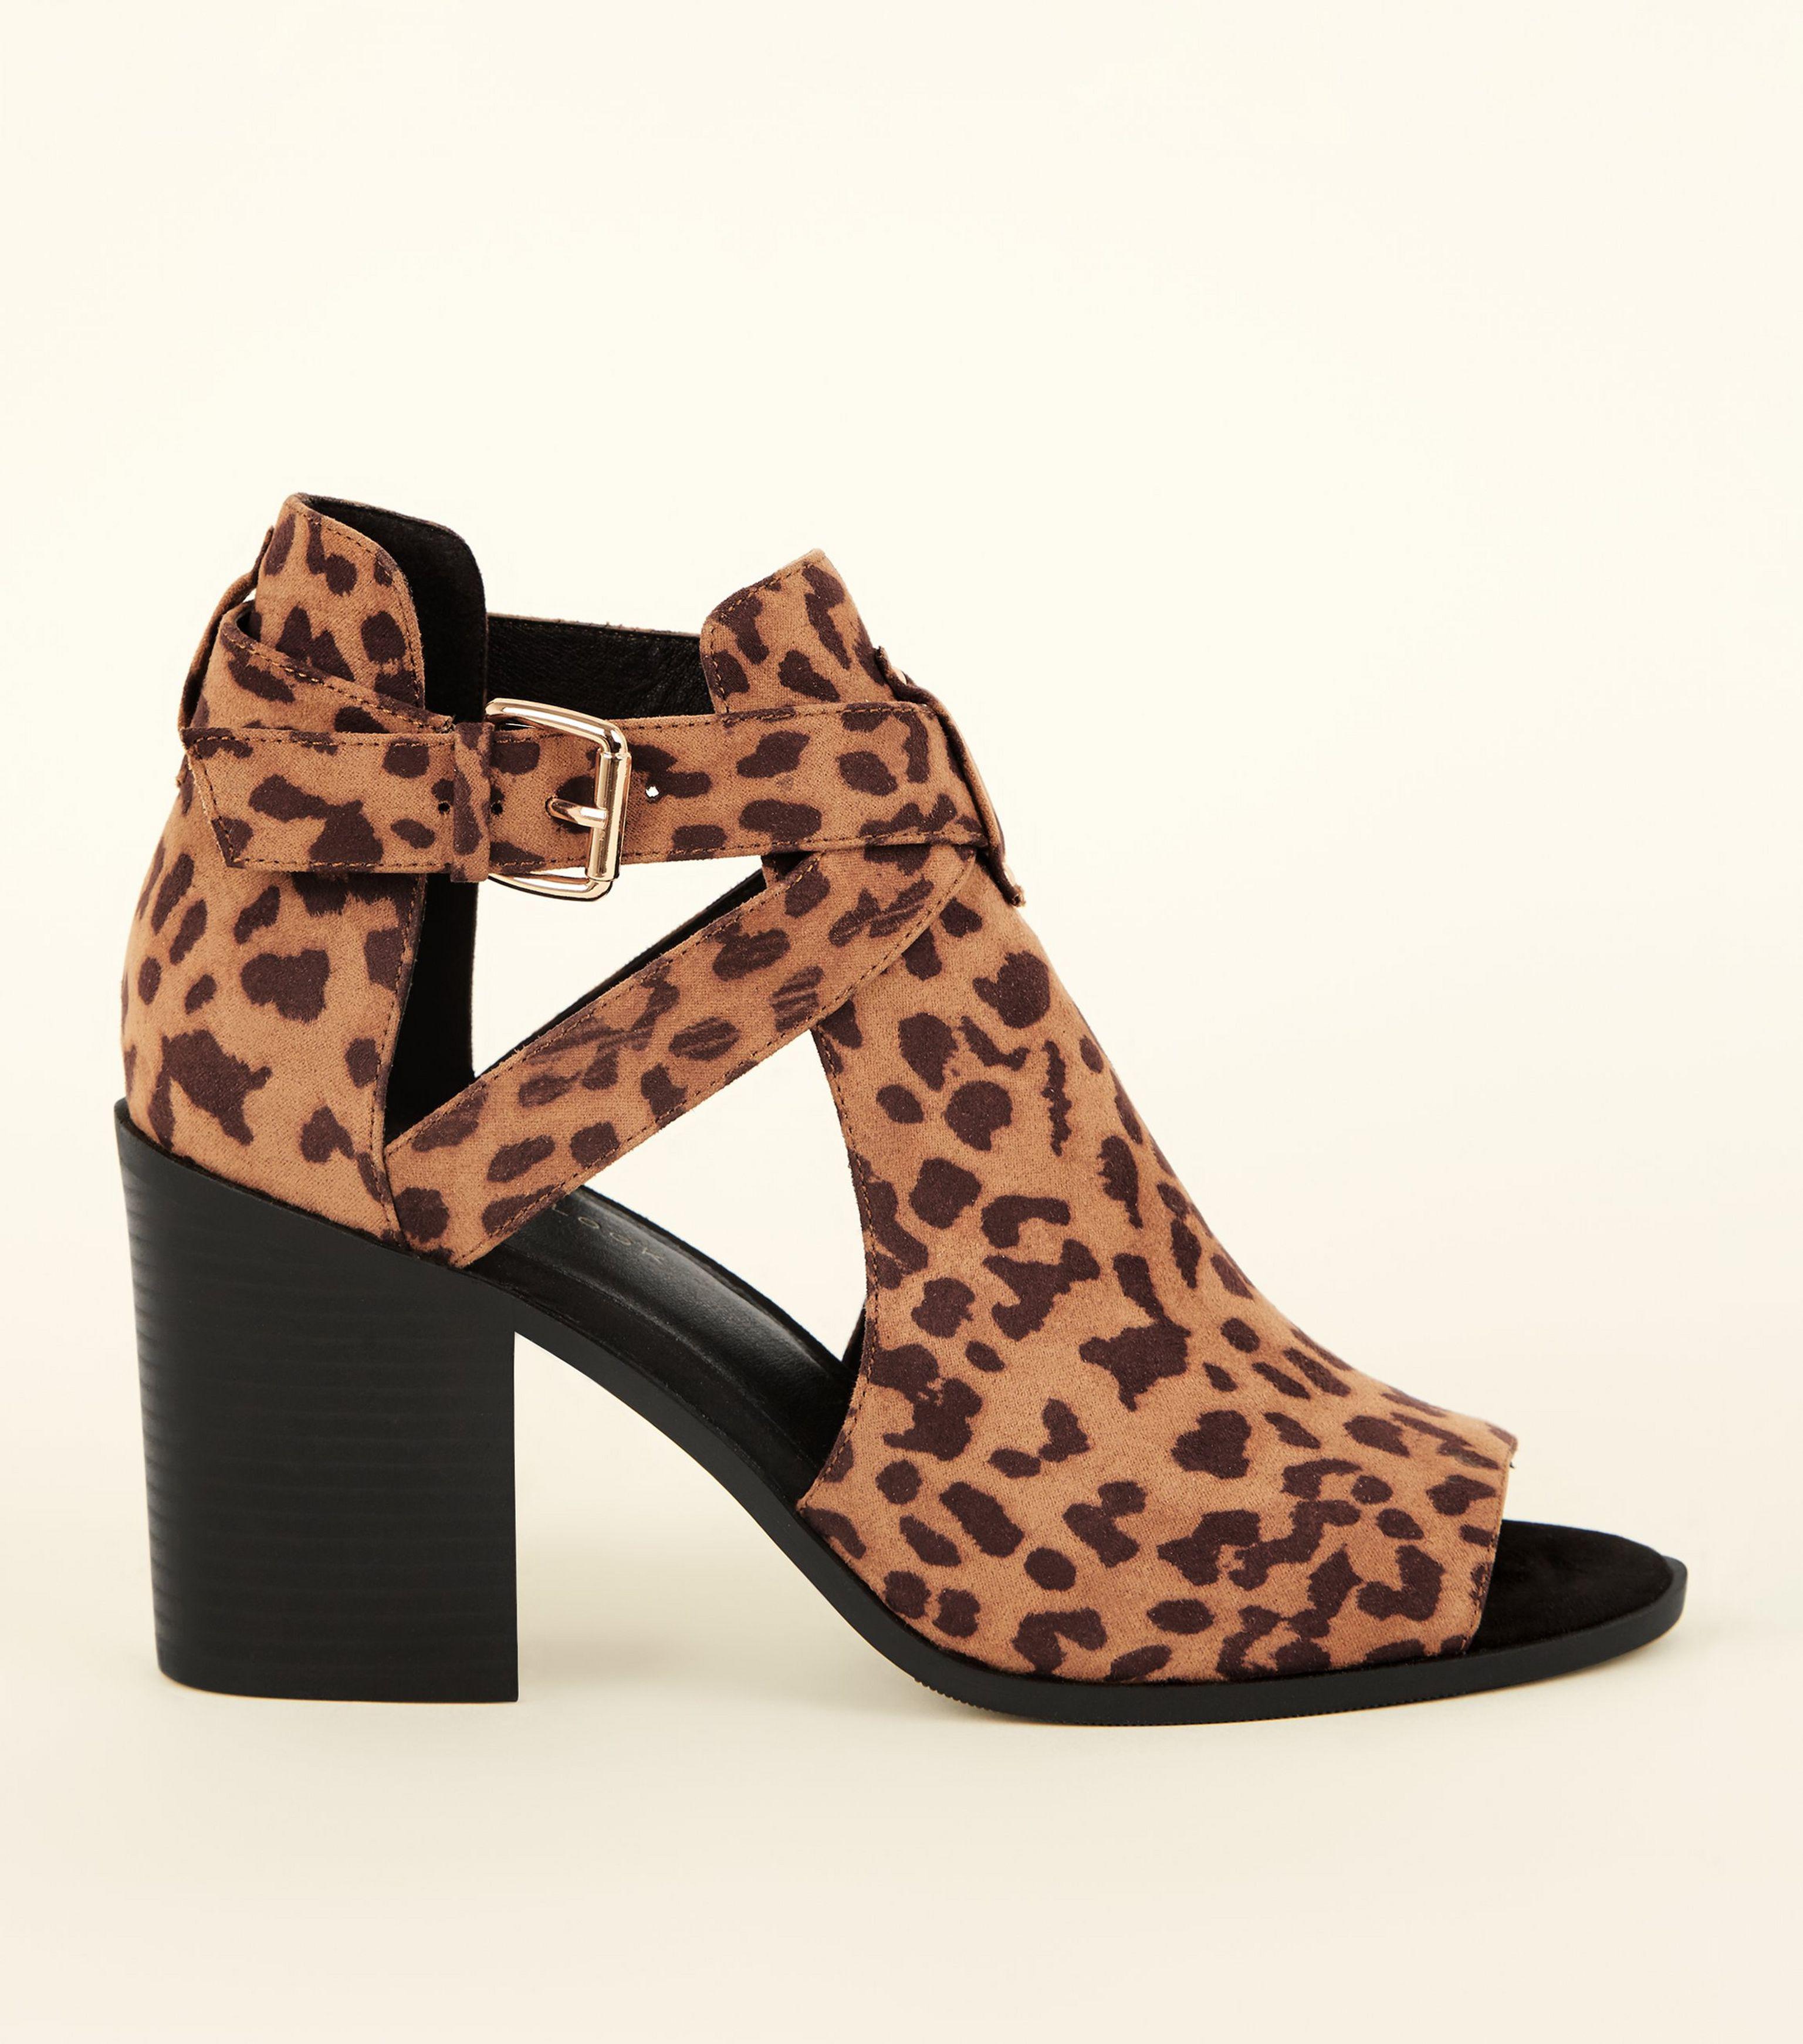 f72d133b0112 New Look Wide Fit Tan Leopard Print Peep Toe Block Heels in Brown - Lyst